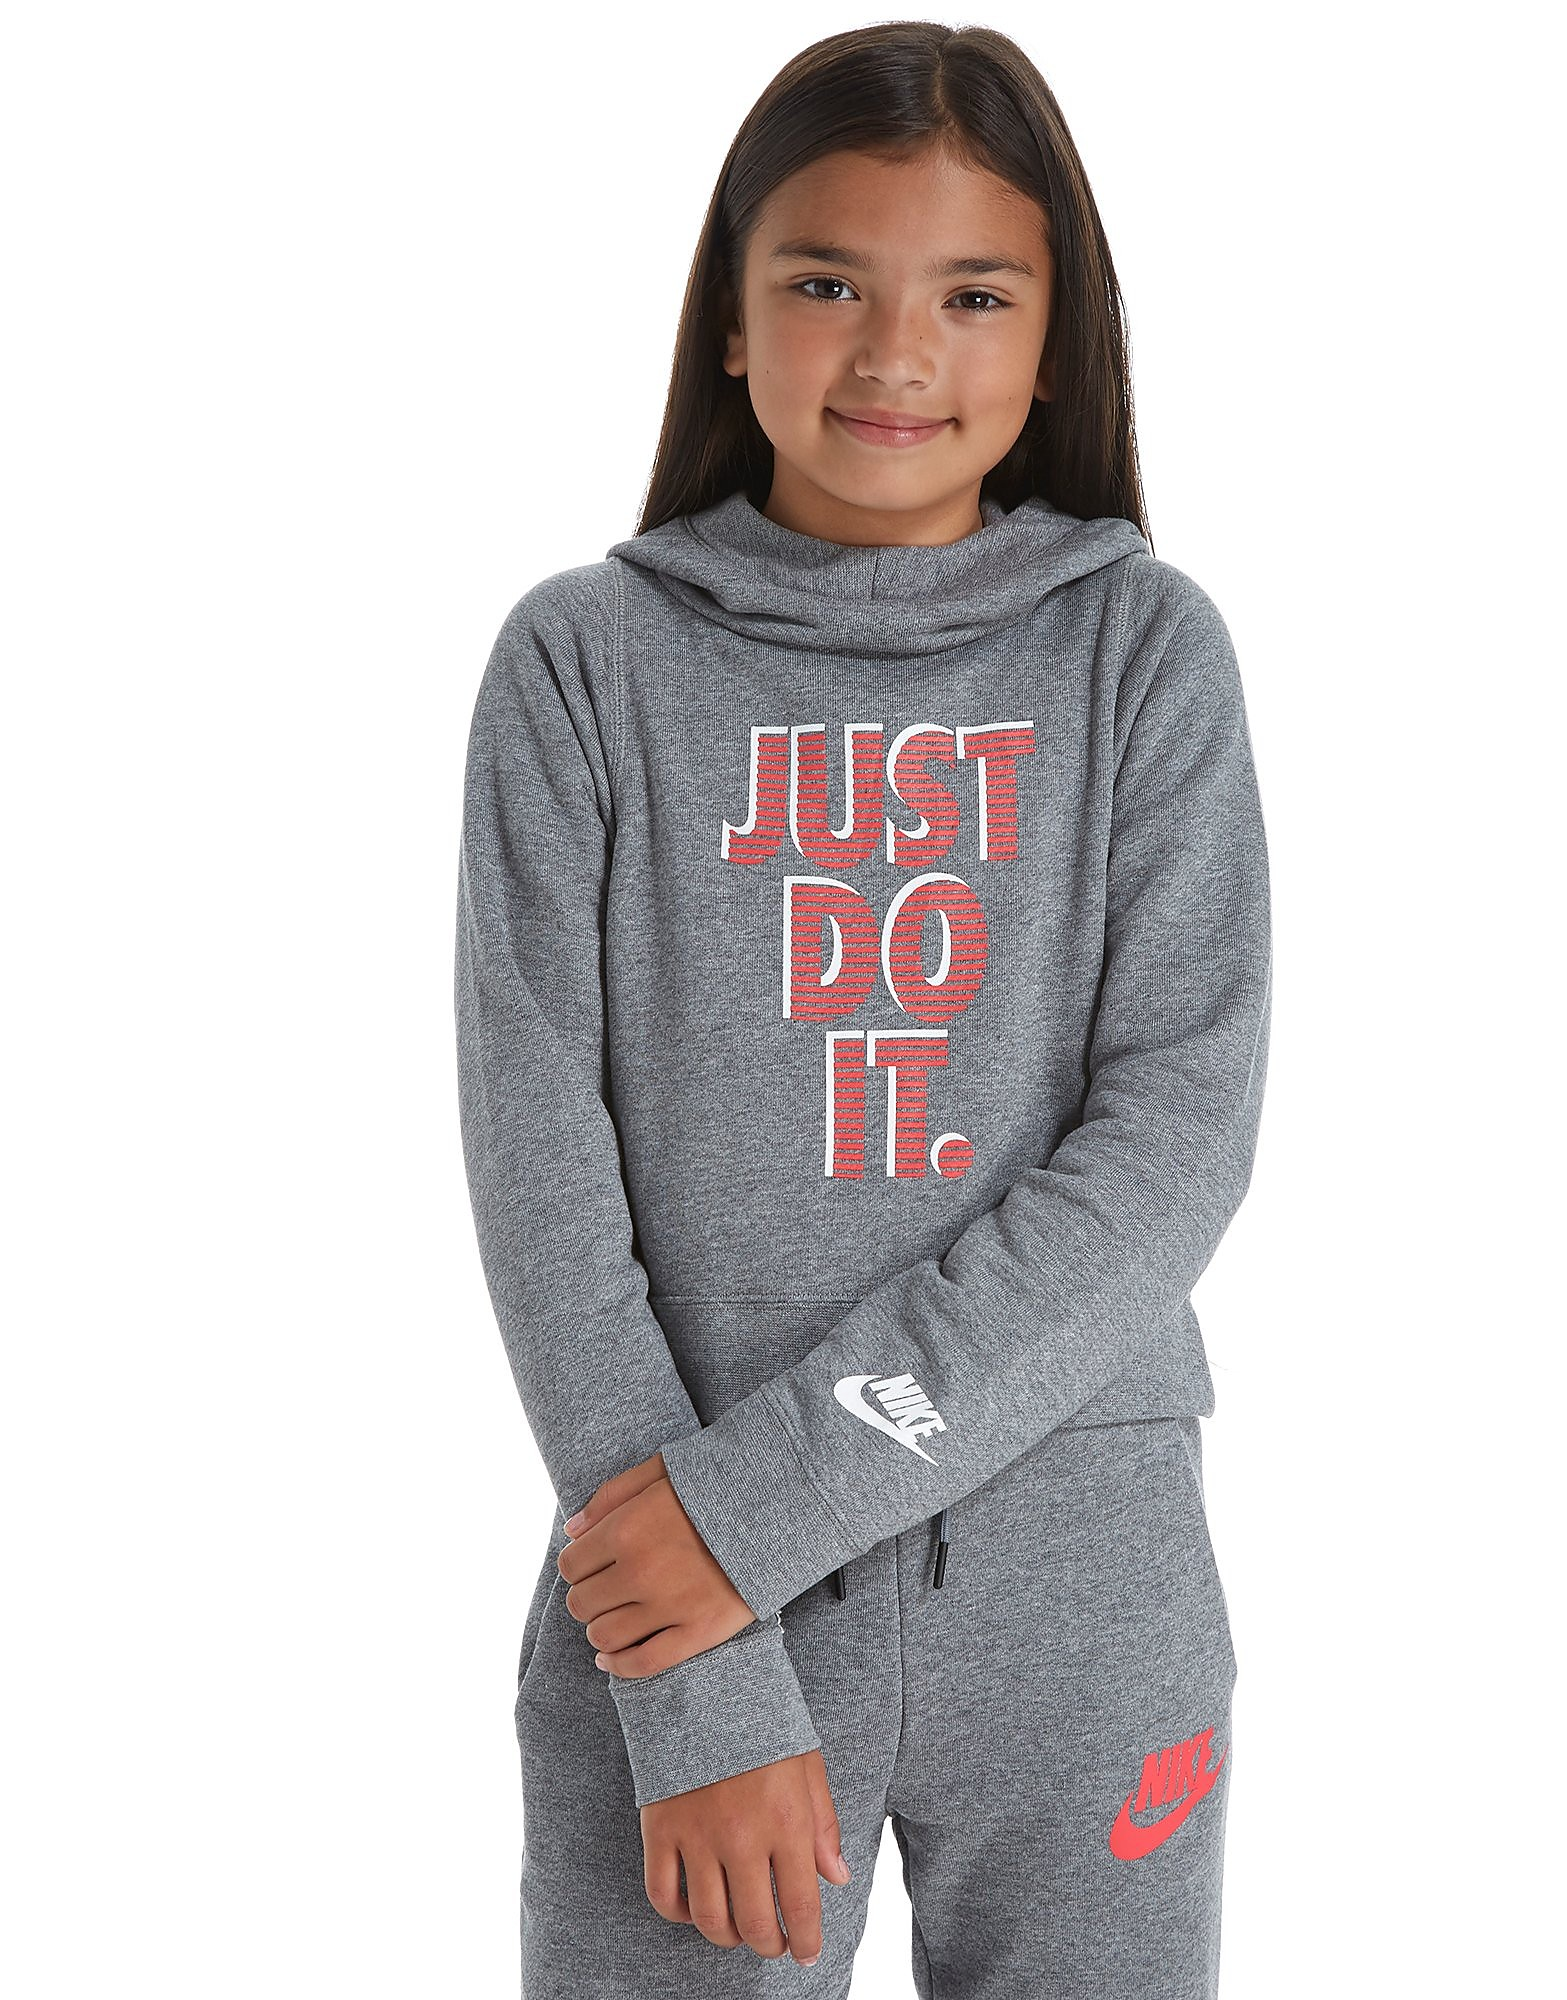 Nike Girls' Just Do It Cropped Hoody Junior